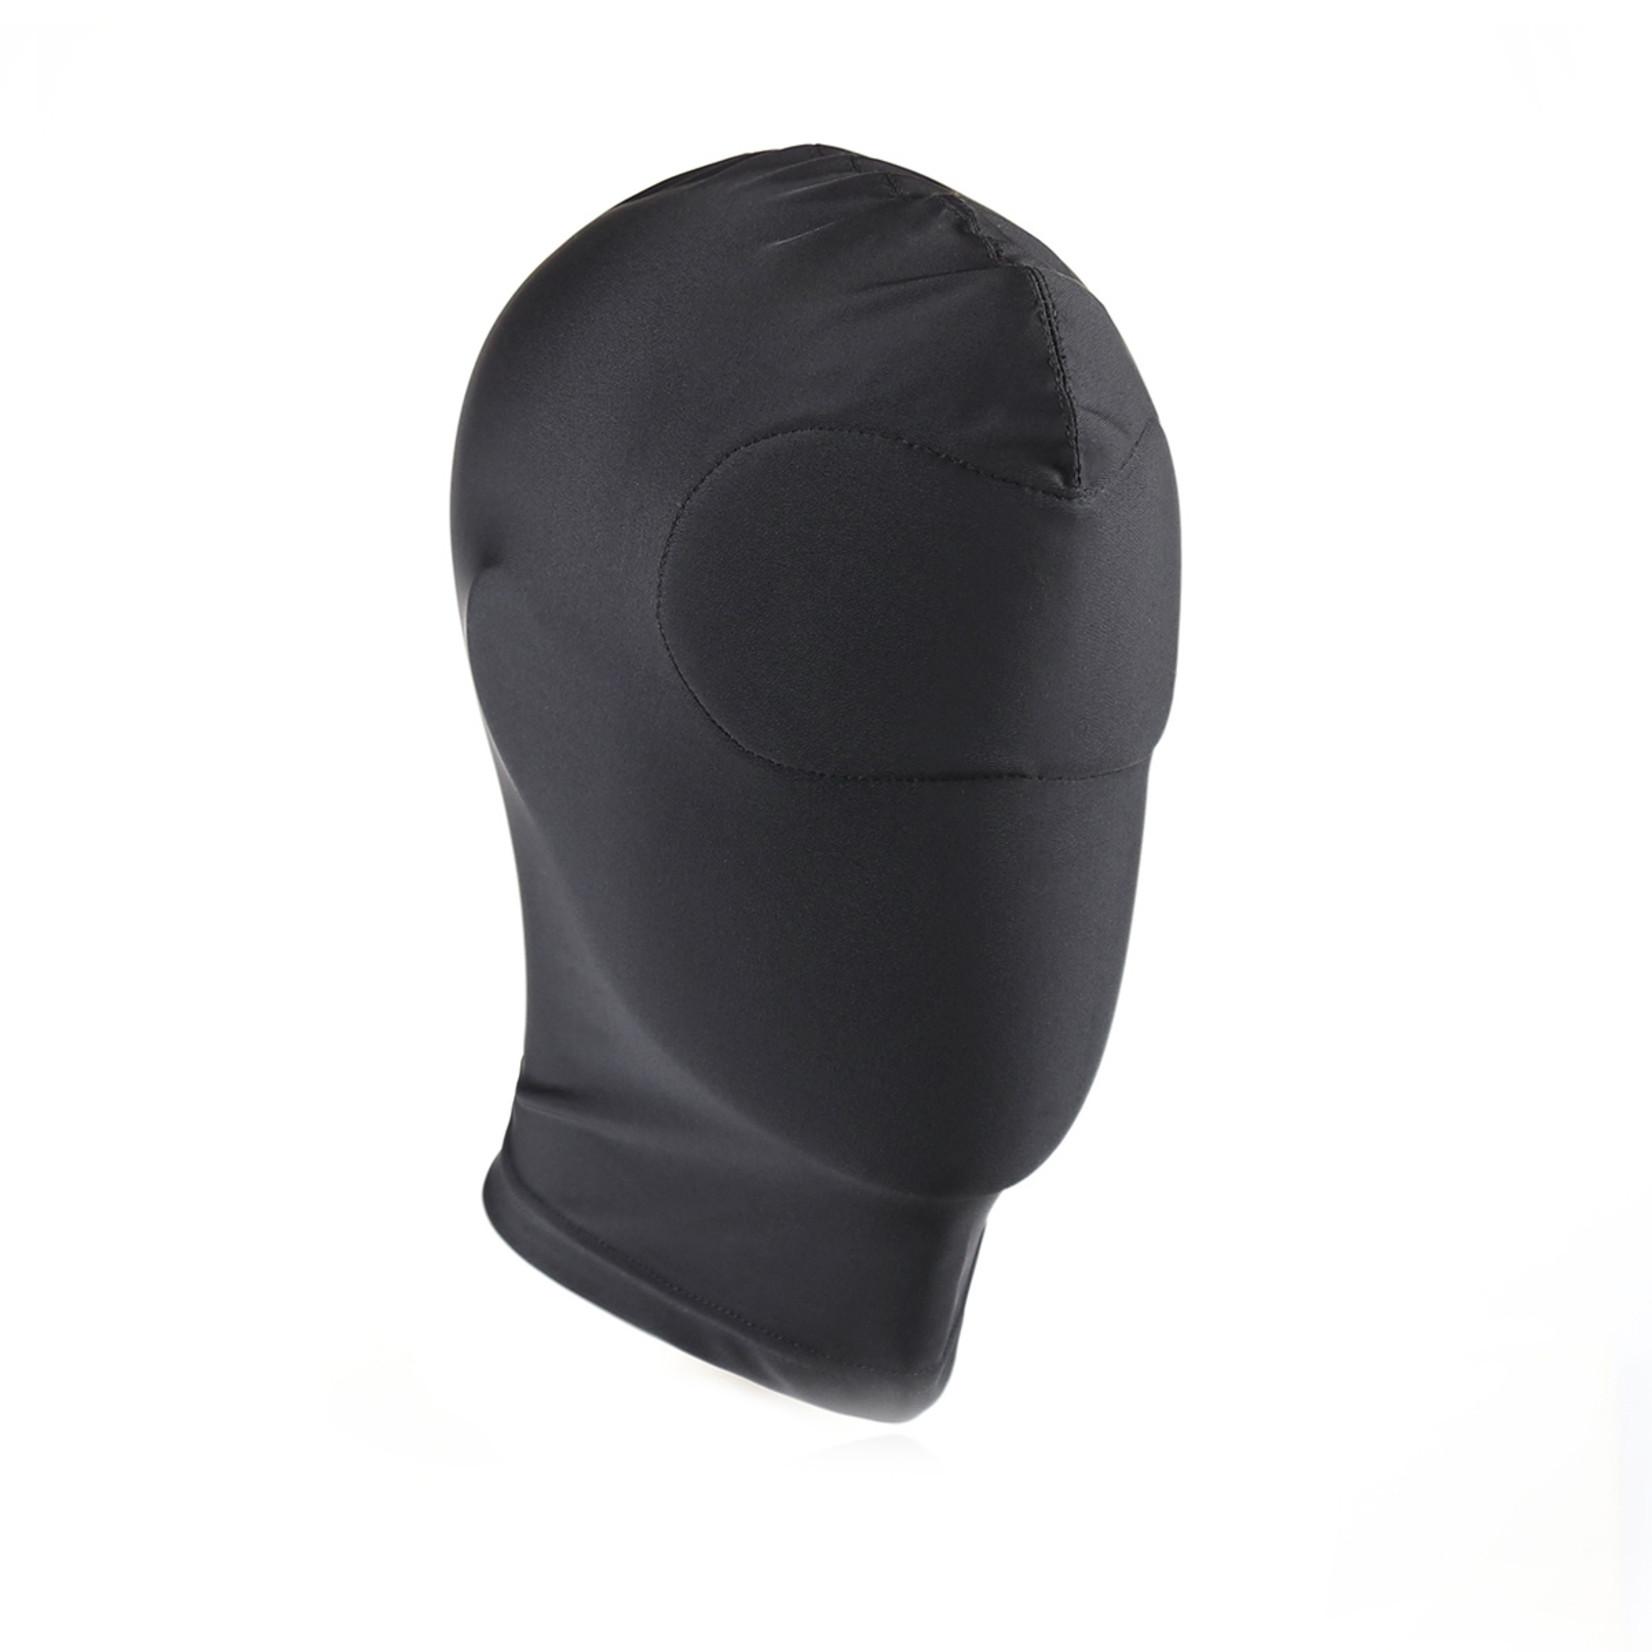 KIOTOS Leather Black BDSM Hood Blind